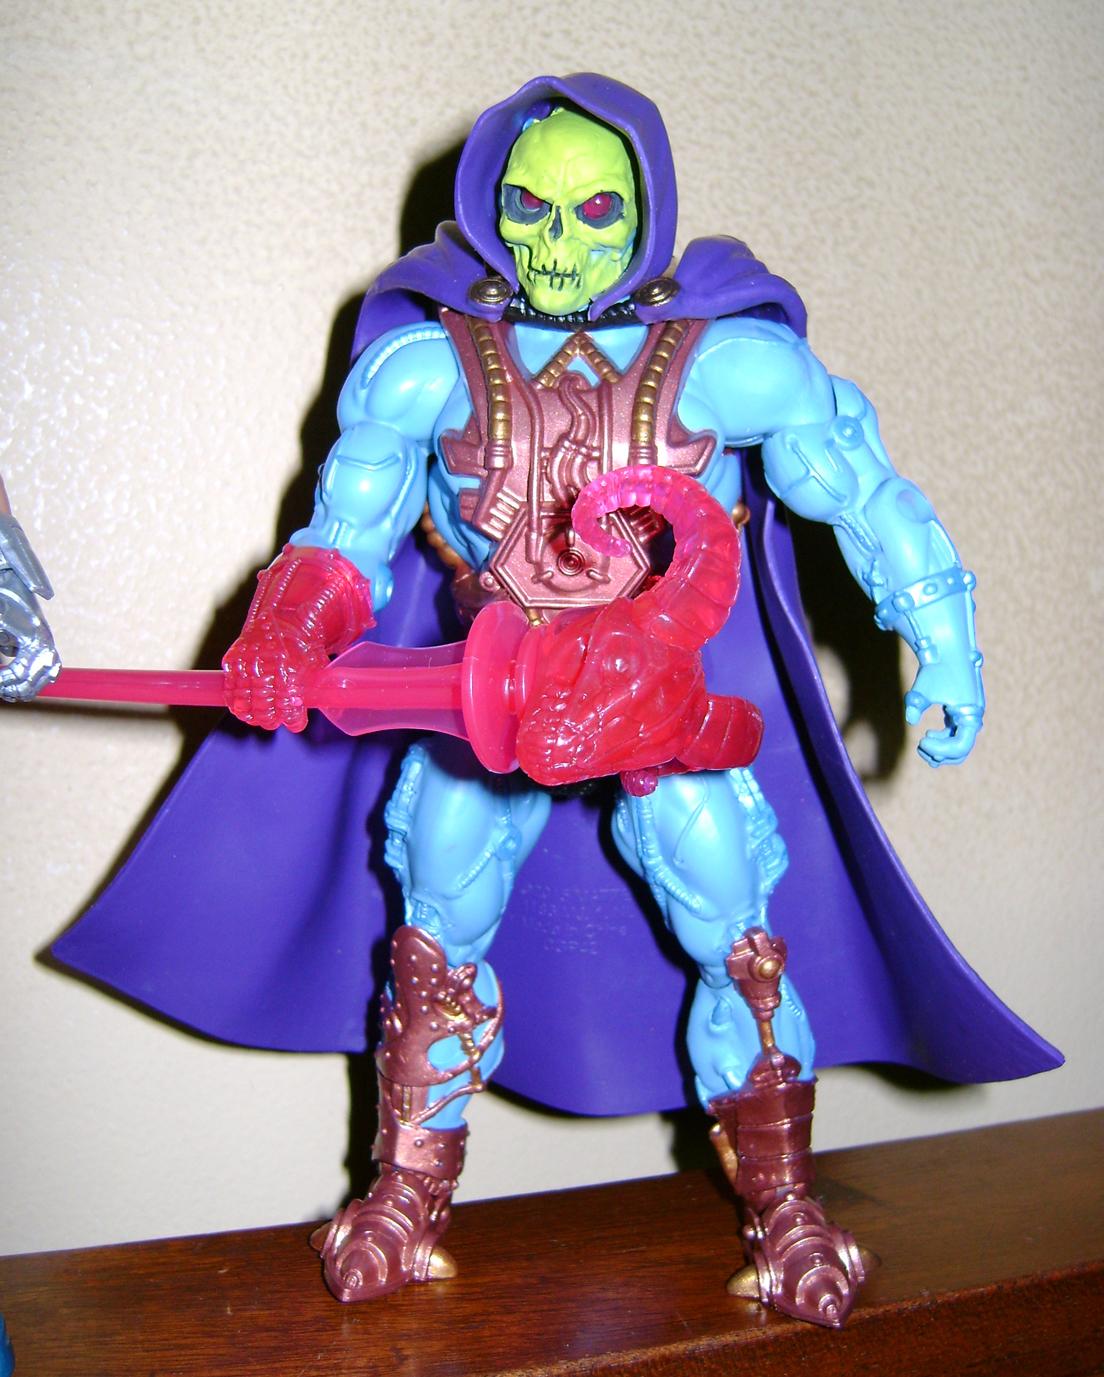 Las 5 Final MOTUC: Prahvus, Son Of He Man and Laser Power He Man With Laser Light Skeletor!